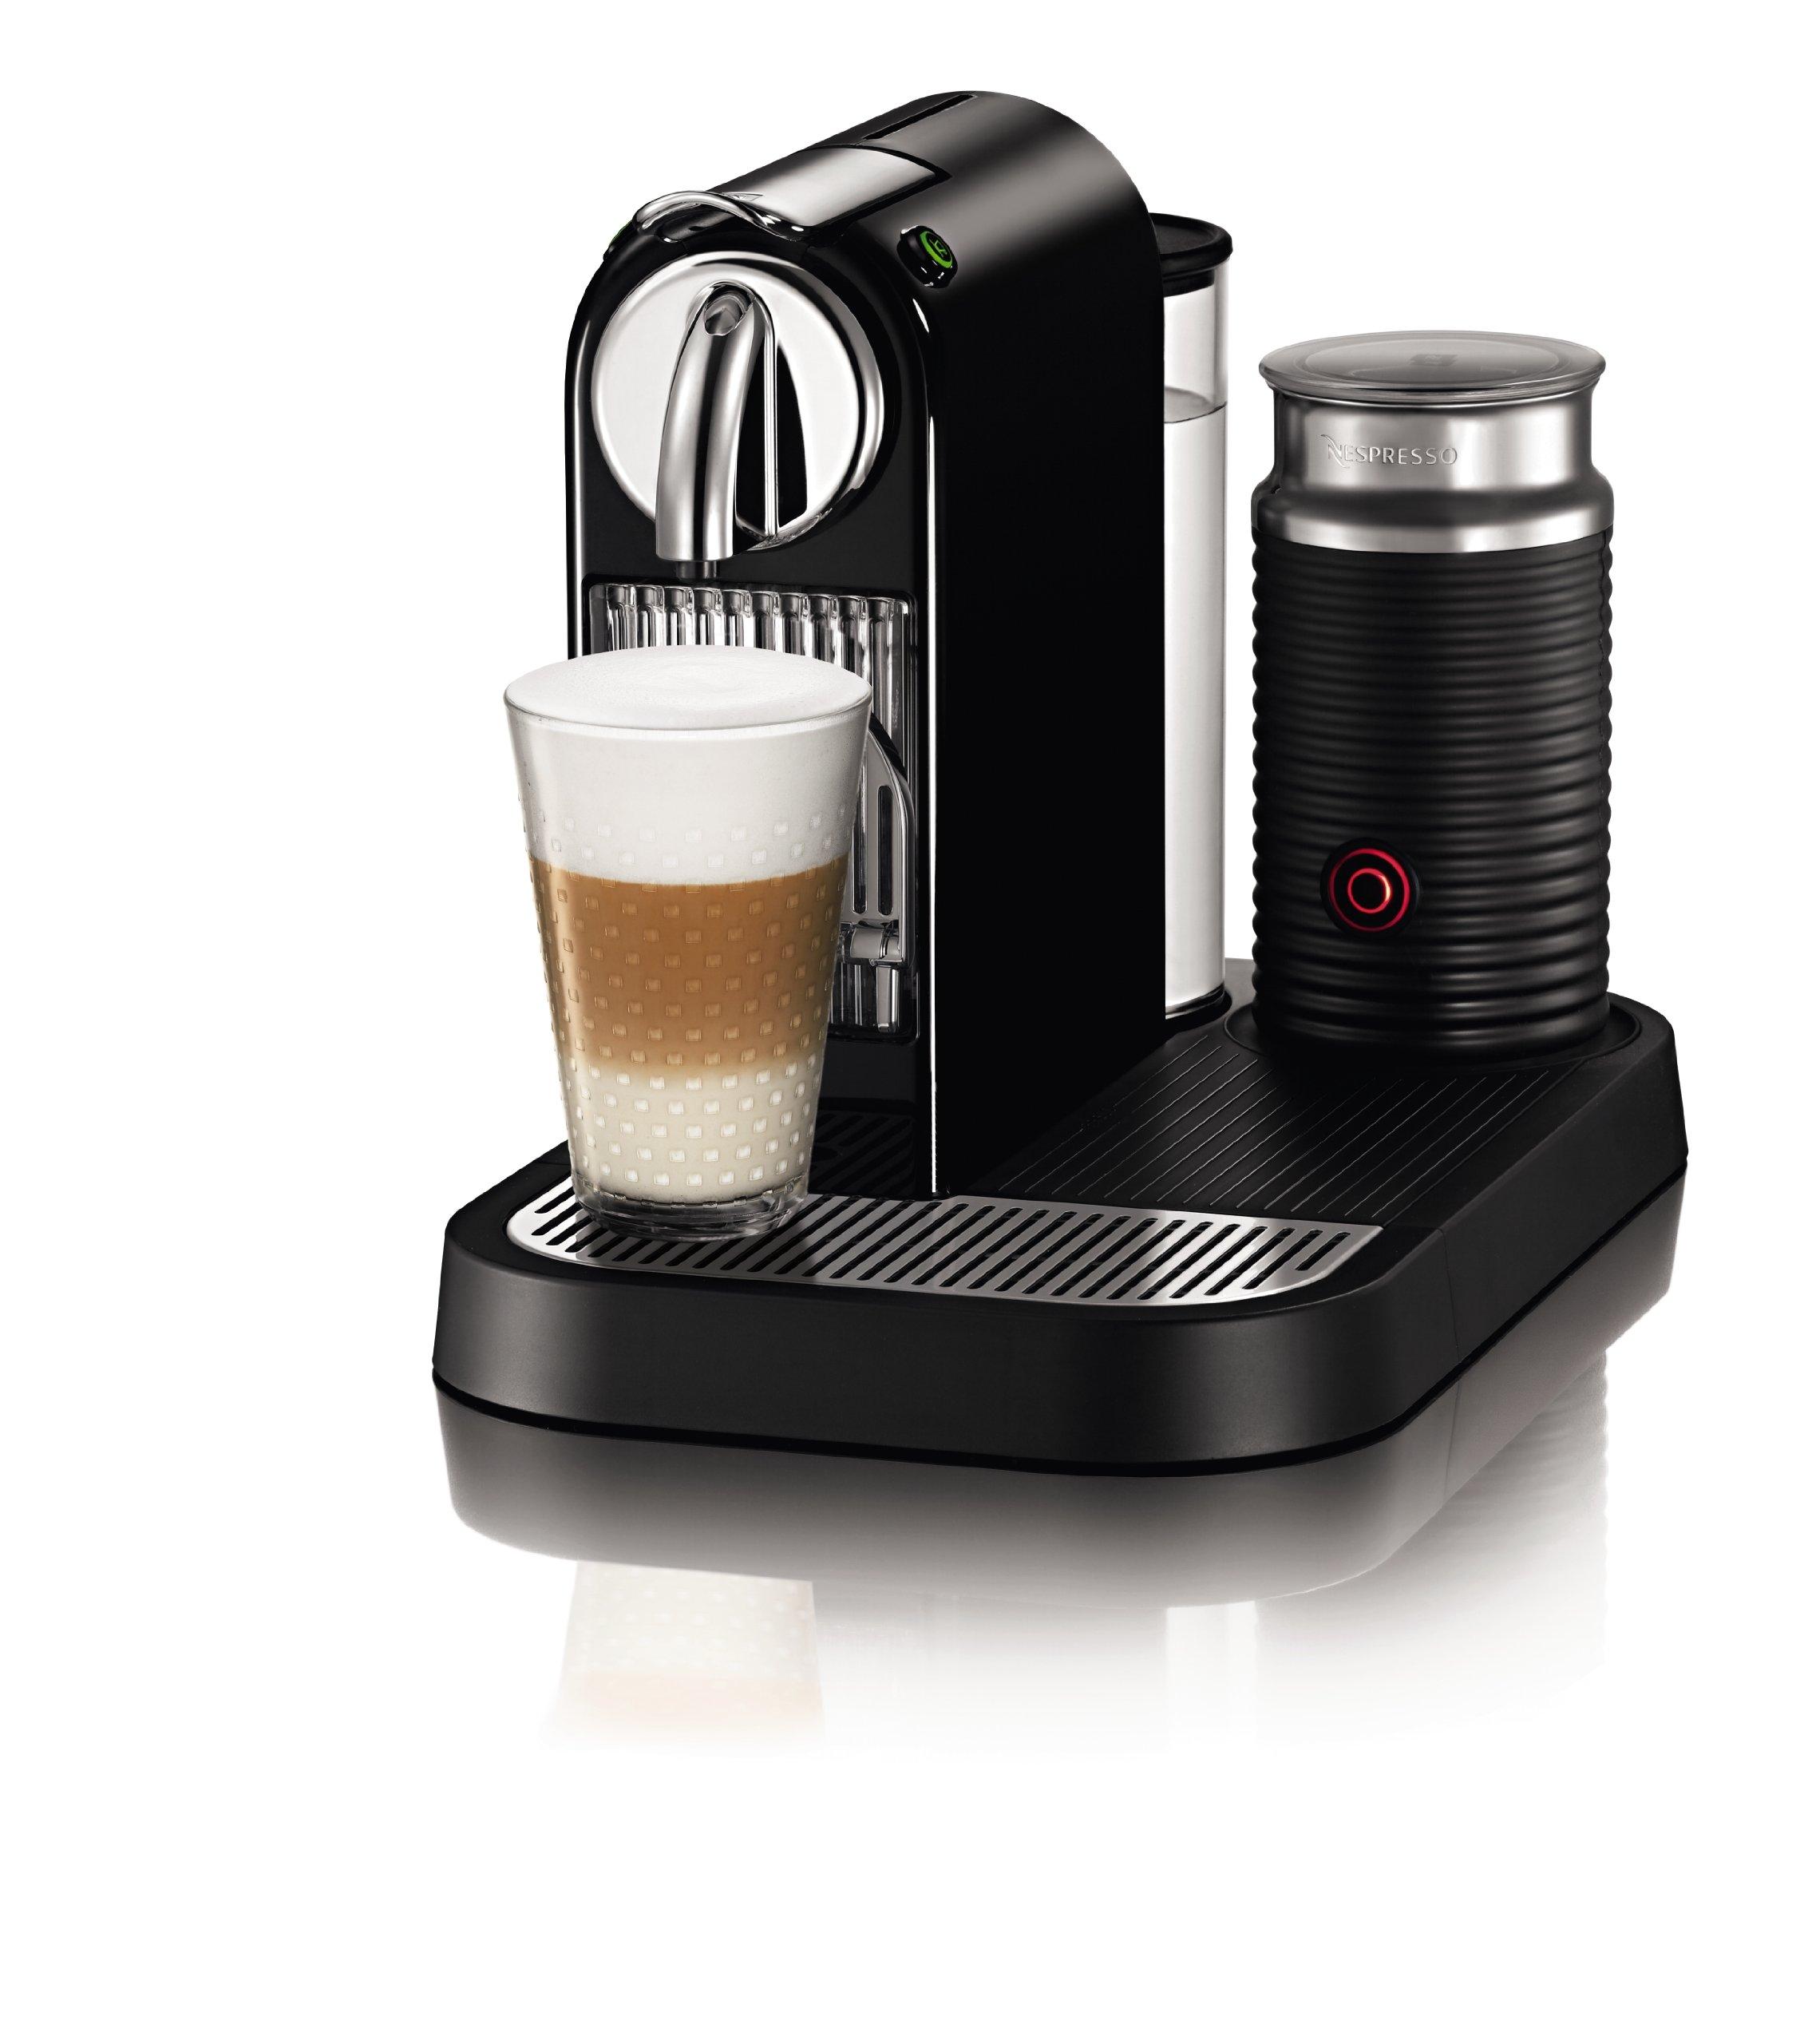 Nespresso D121-US4-BK-NE1 Citiz Espresso Maker with Aeroccino Milk Frother, Black by Nestle Nespresso